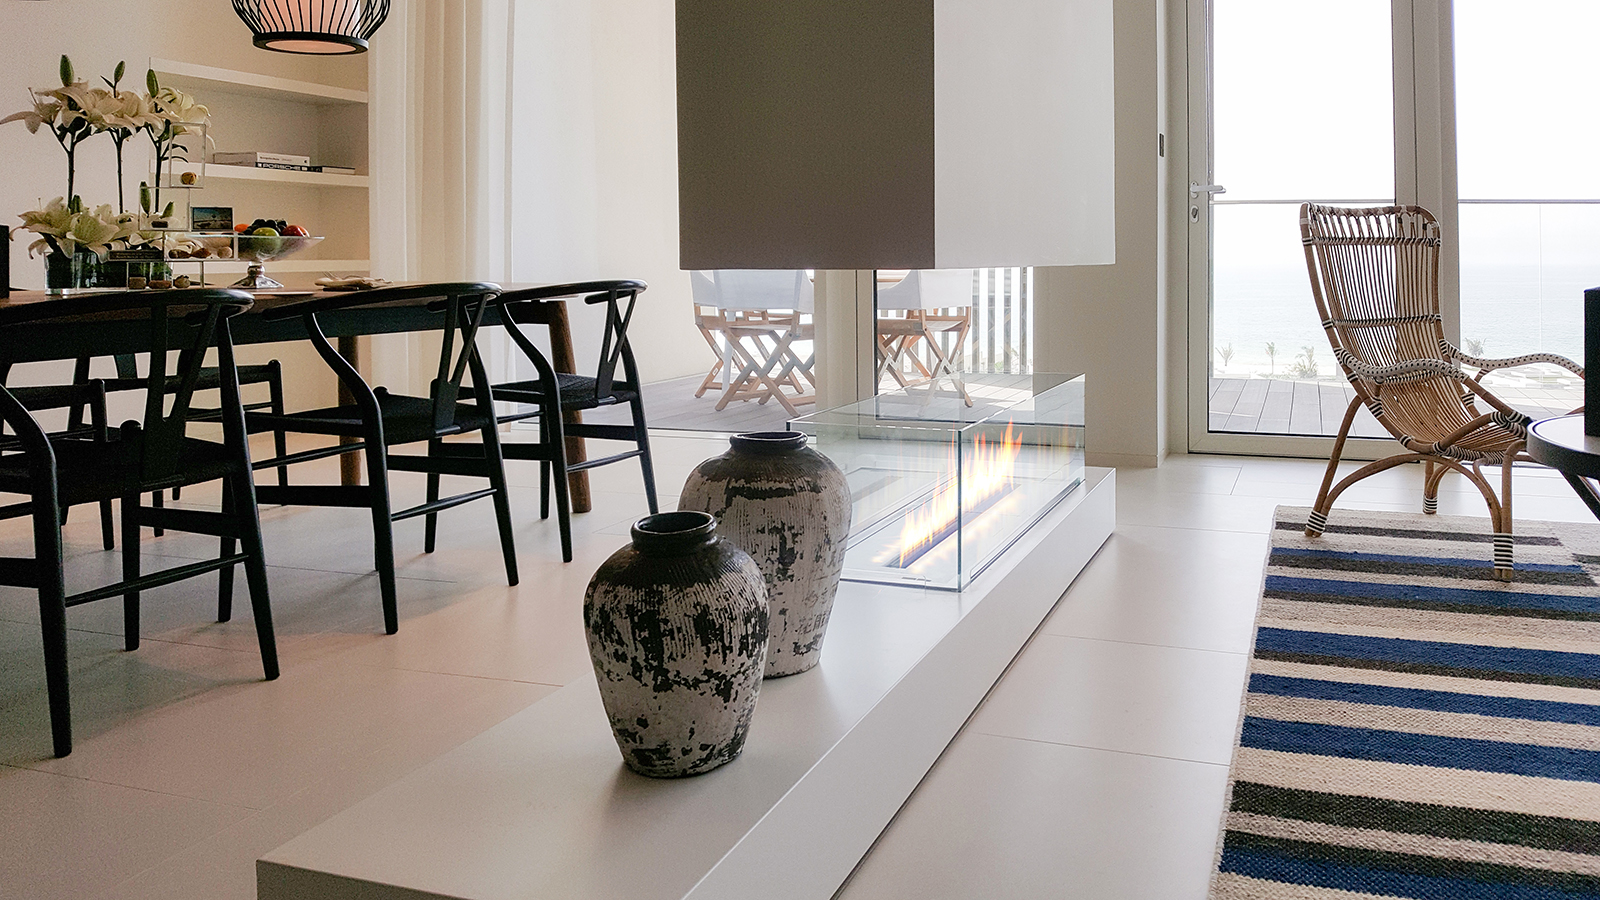 Luxury-Suite-in-The-Oberoi-Beach-Resort-Al-Zorah-Ajman-UAE-2.jpg